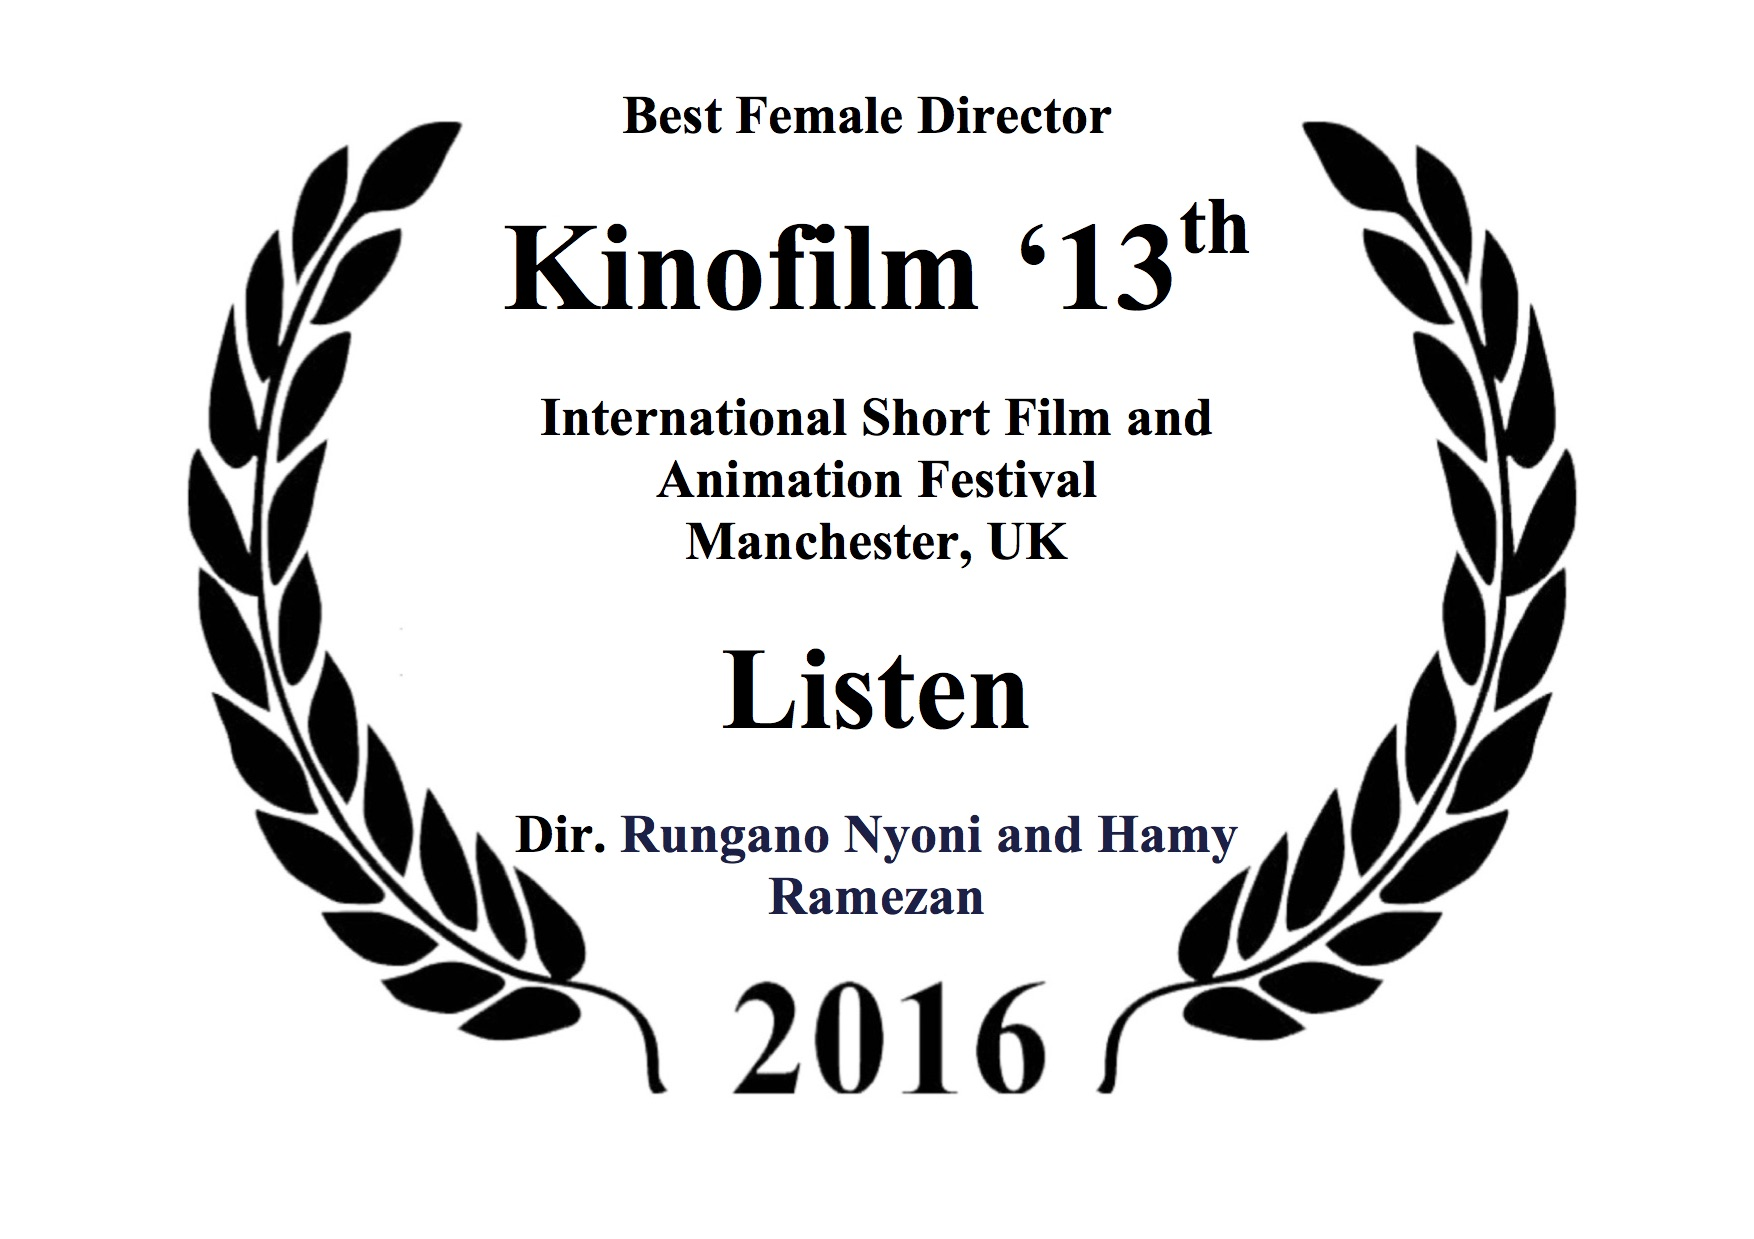 Best Female Director